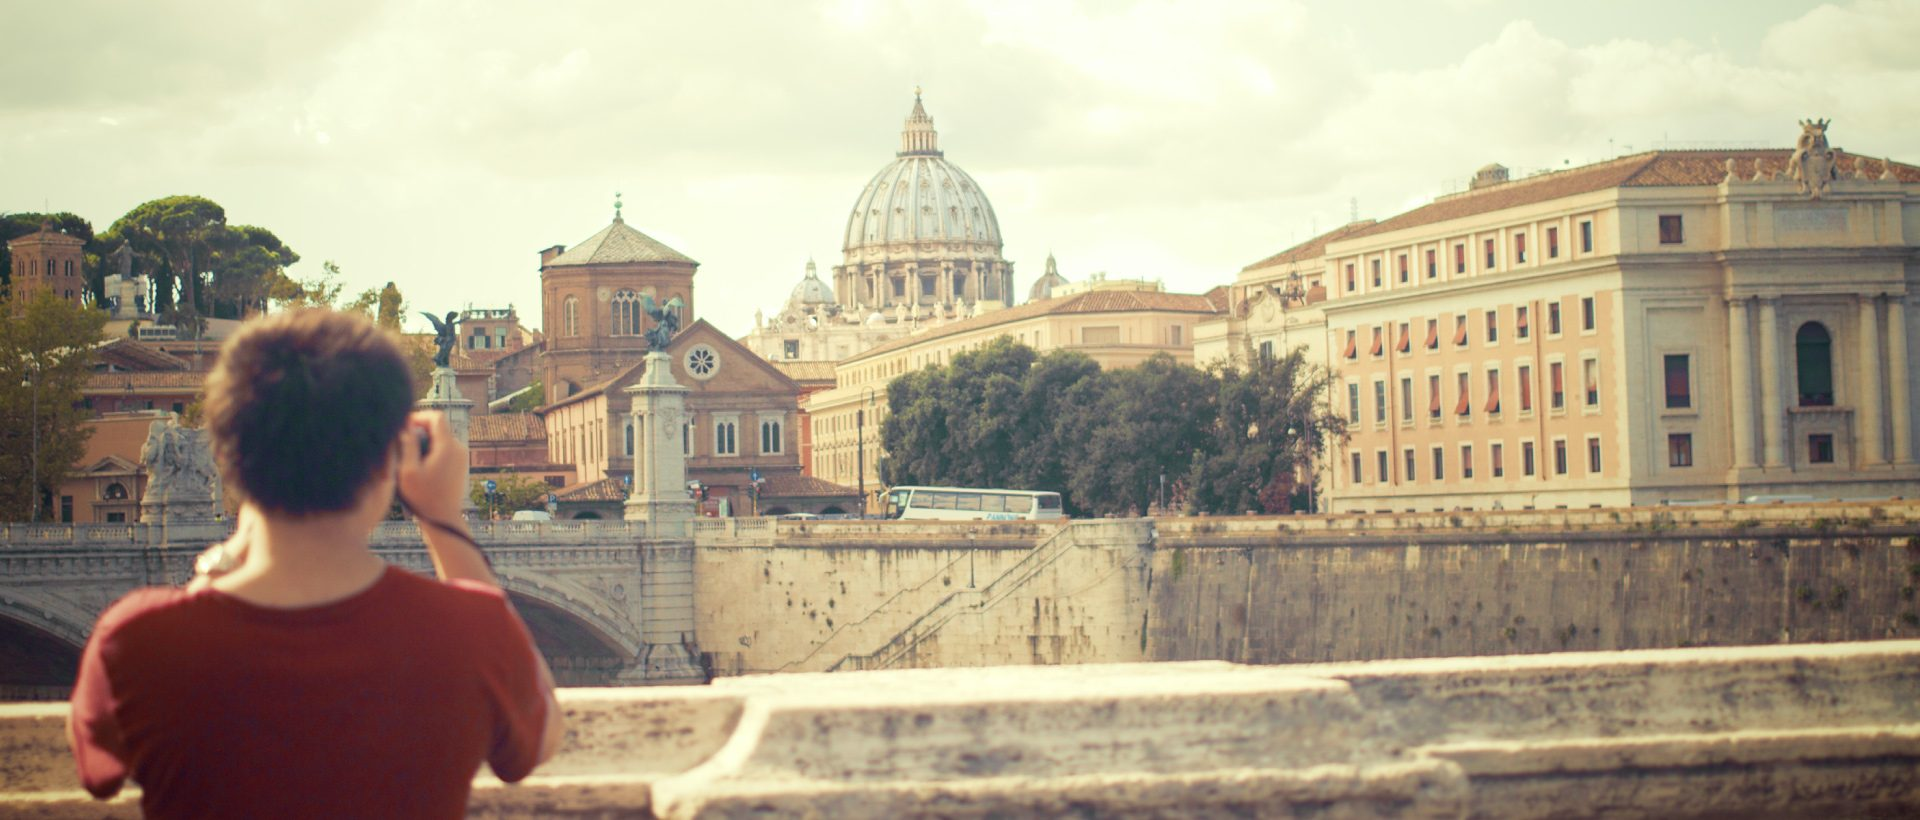 Who Is Truly Catholic?